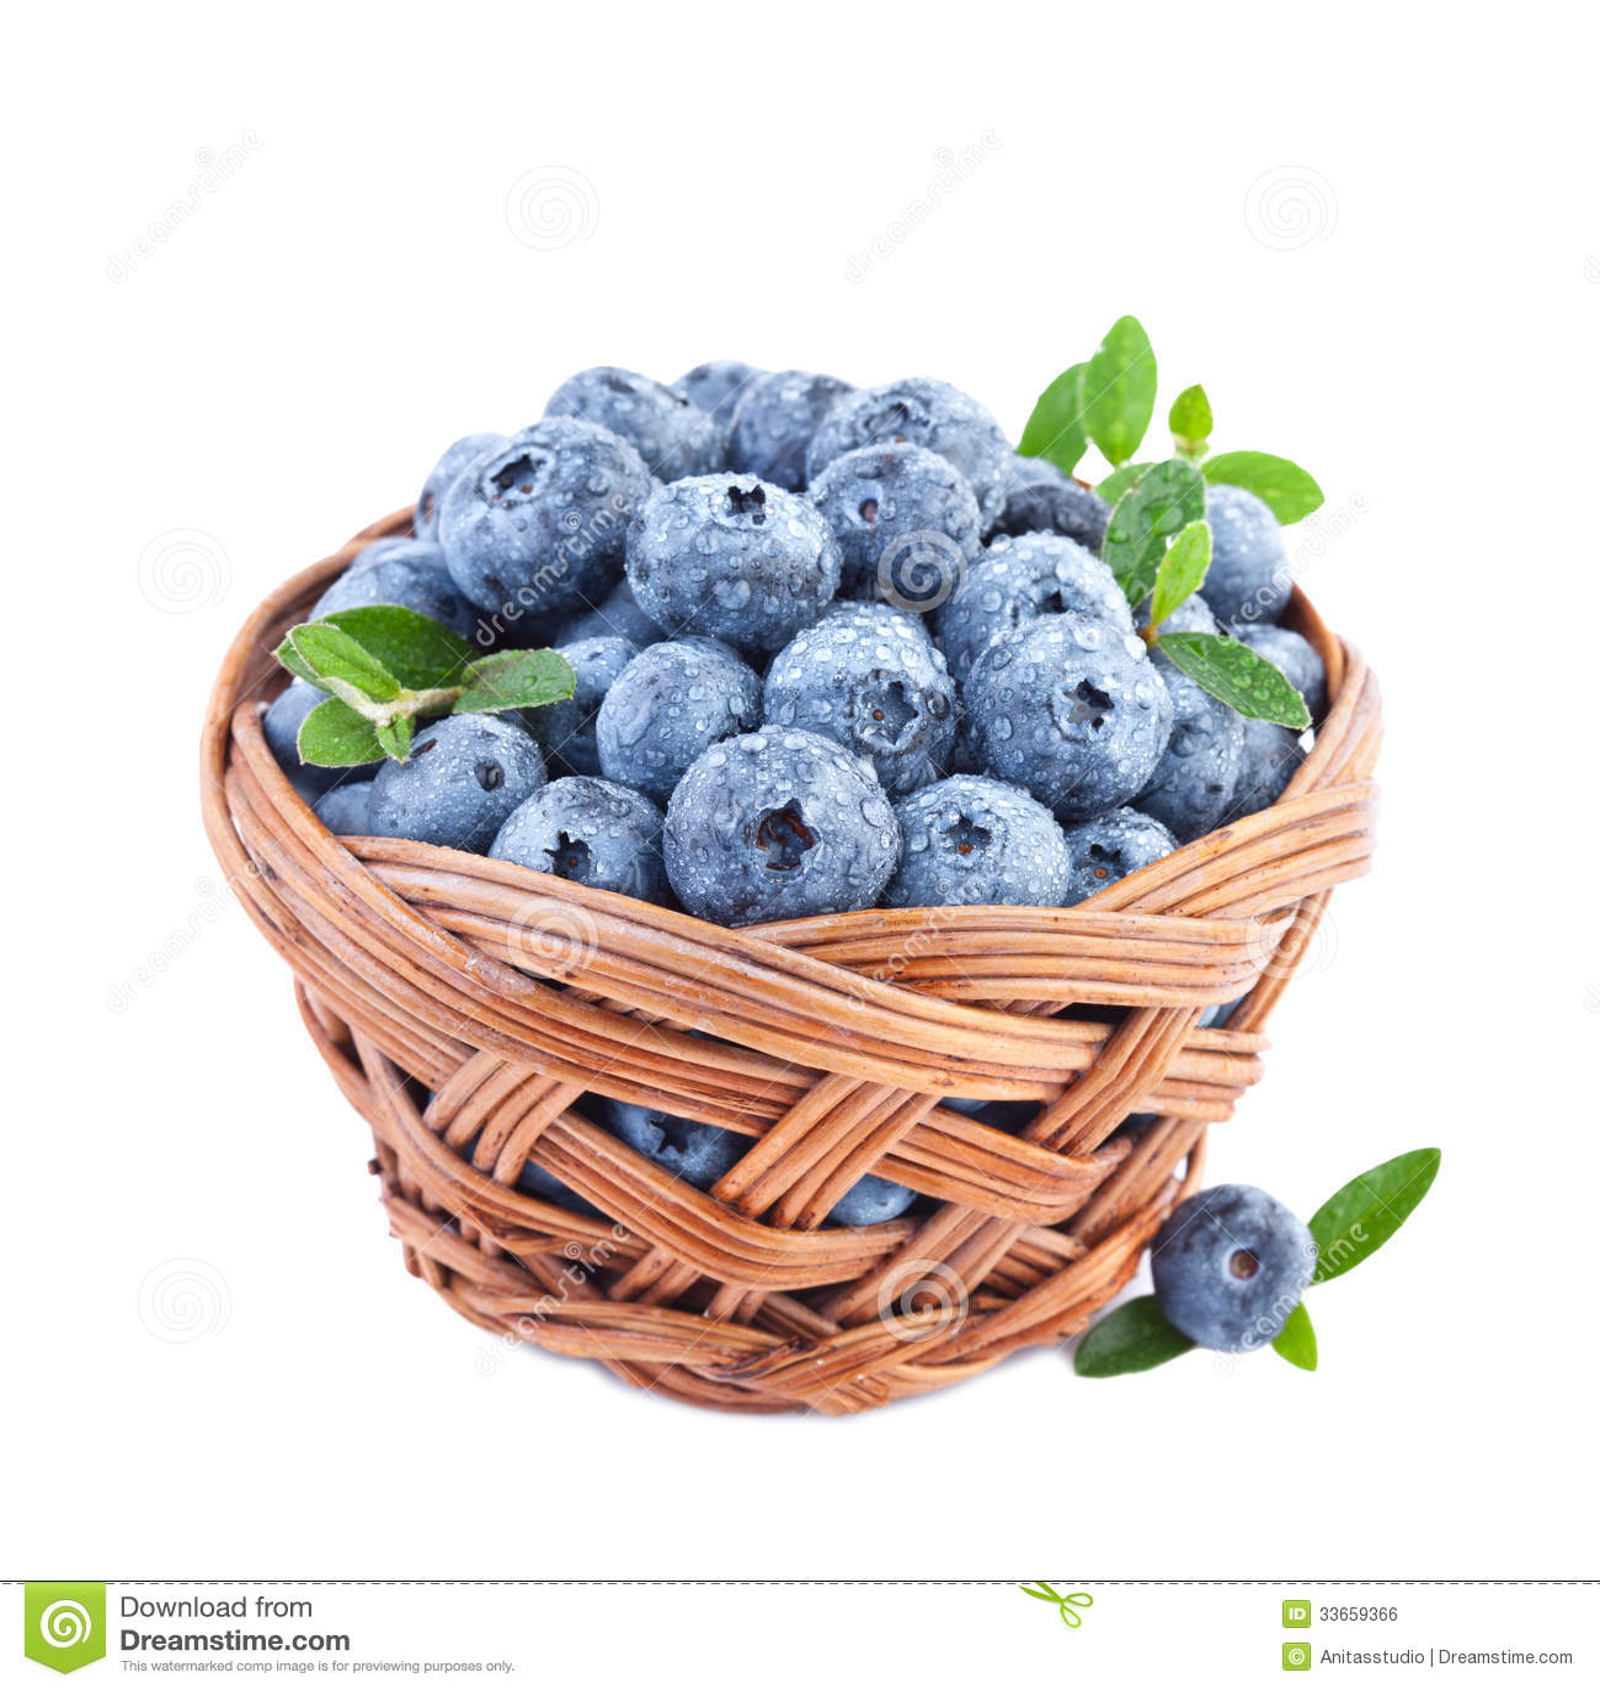 blueberry farm business plan